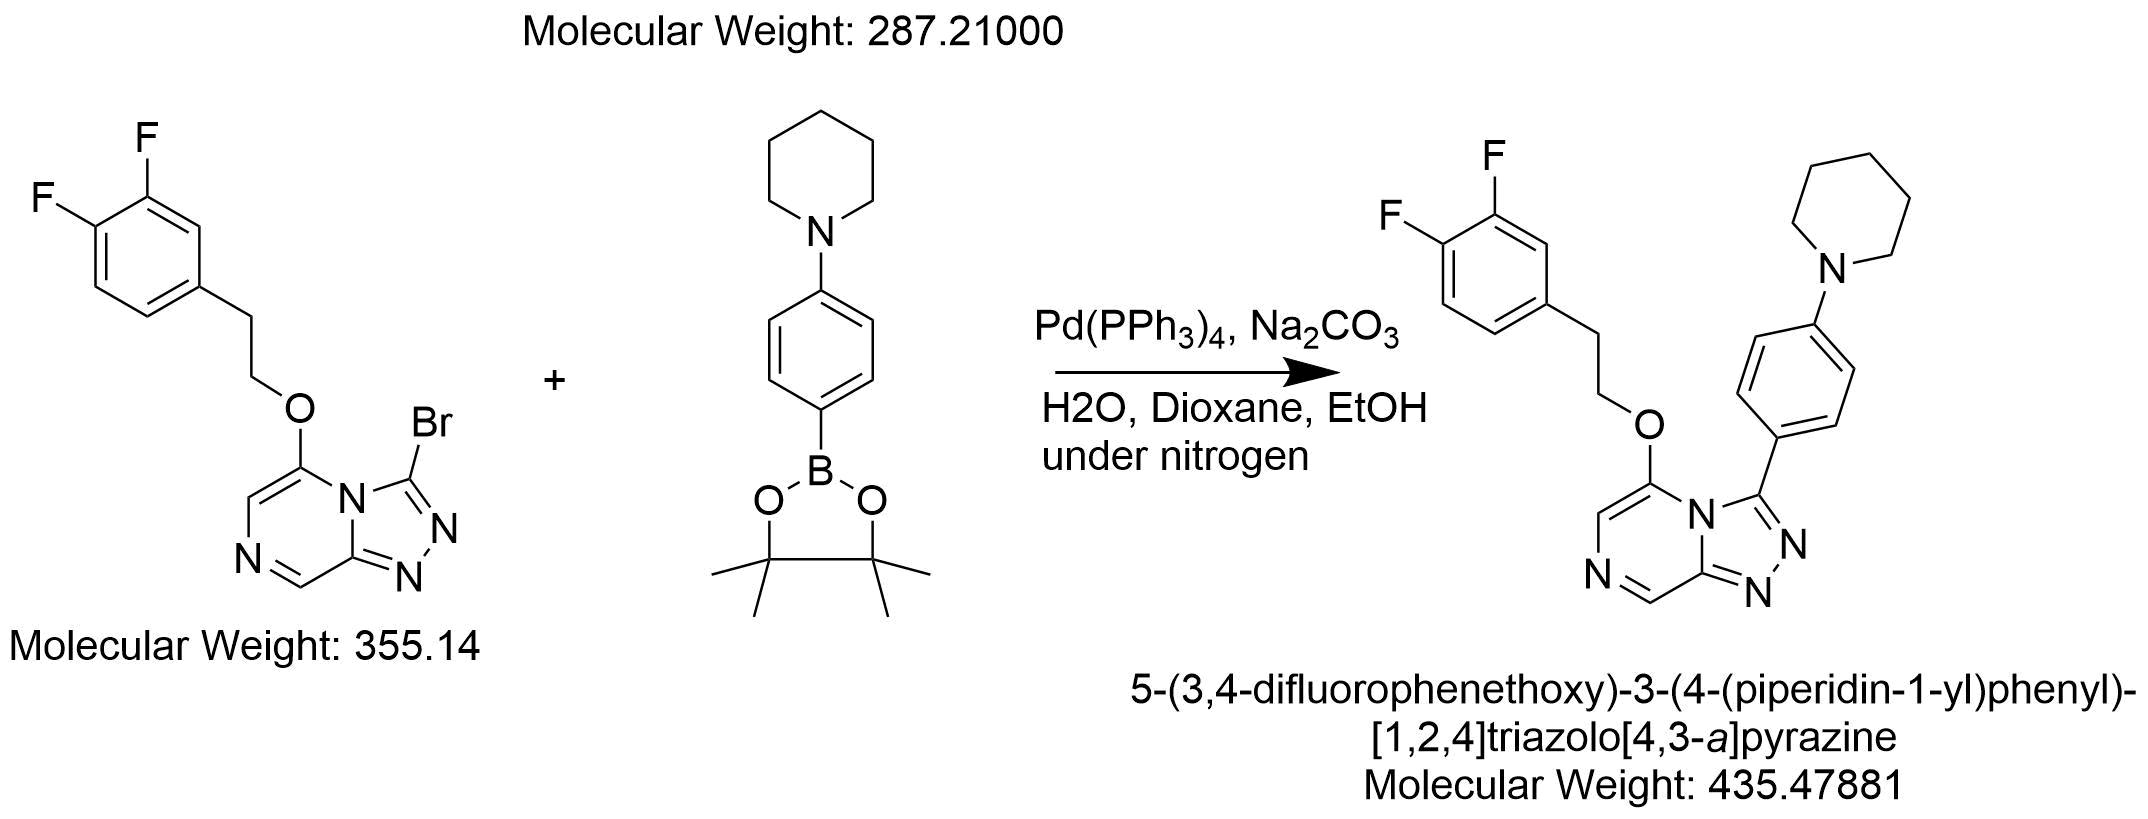 mk042-1